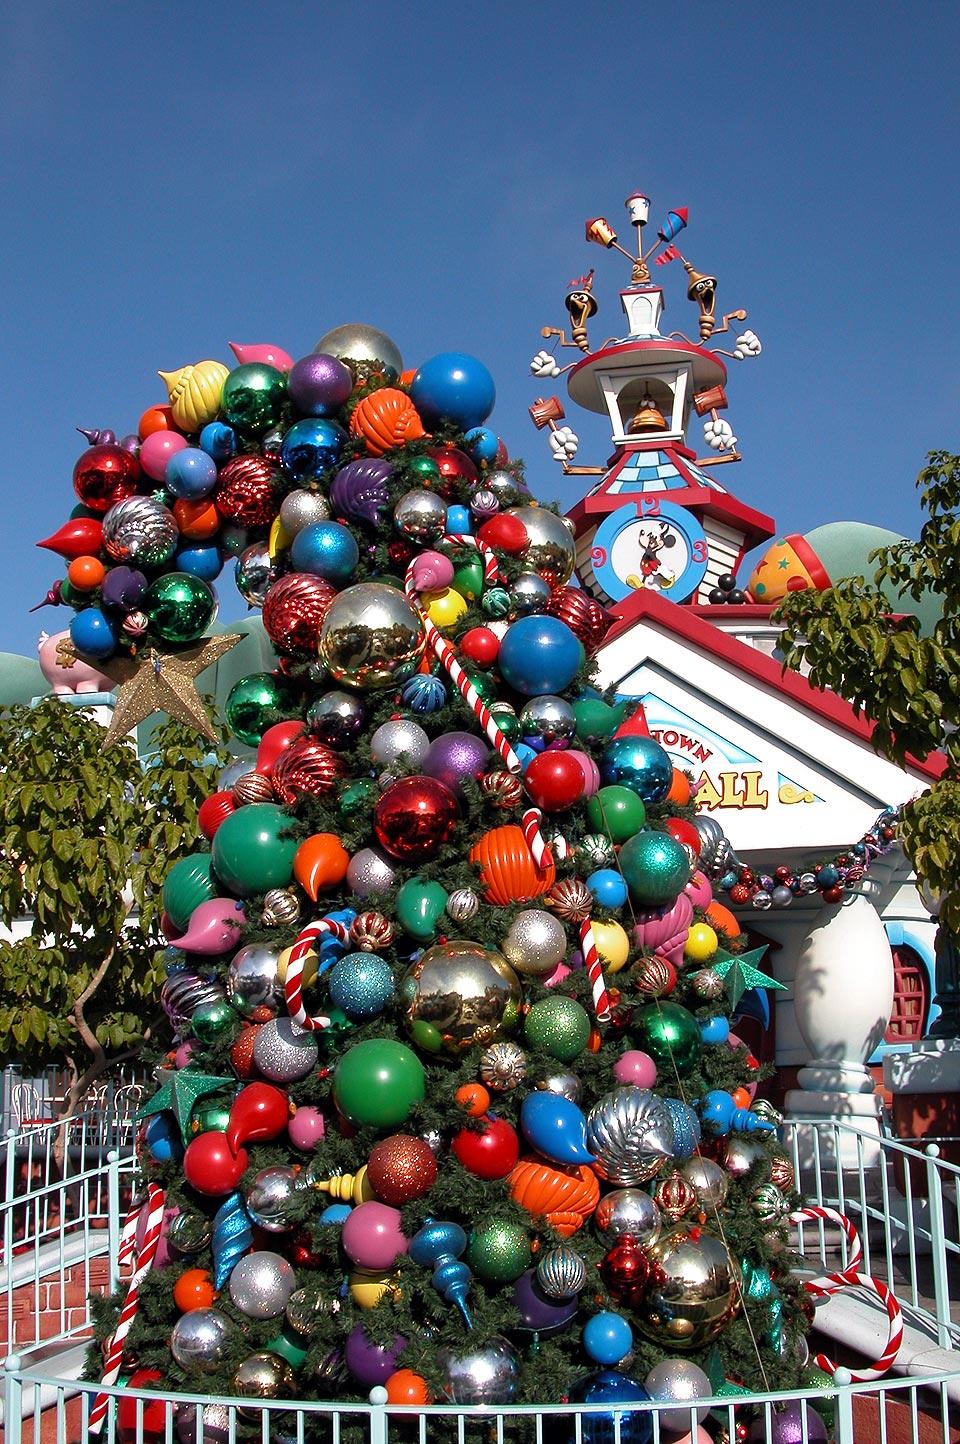 Overly Christmas.Christmas Photos From Disneyland Beyond The Berm